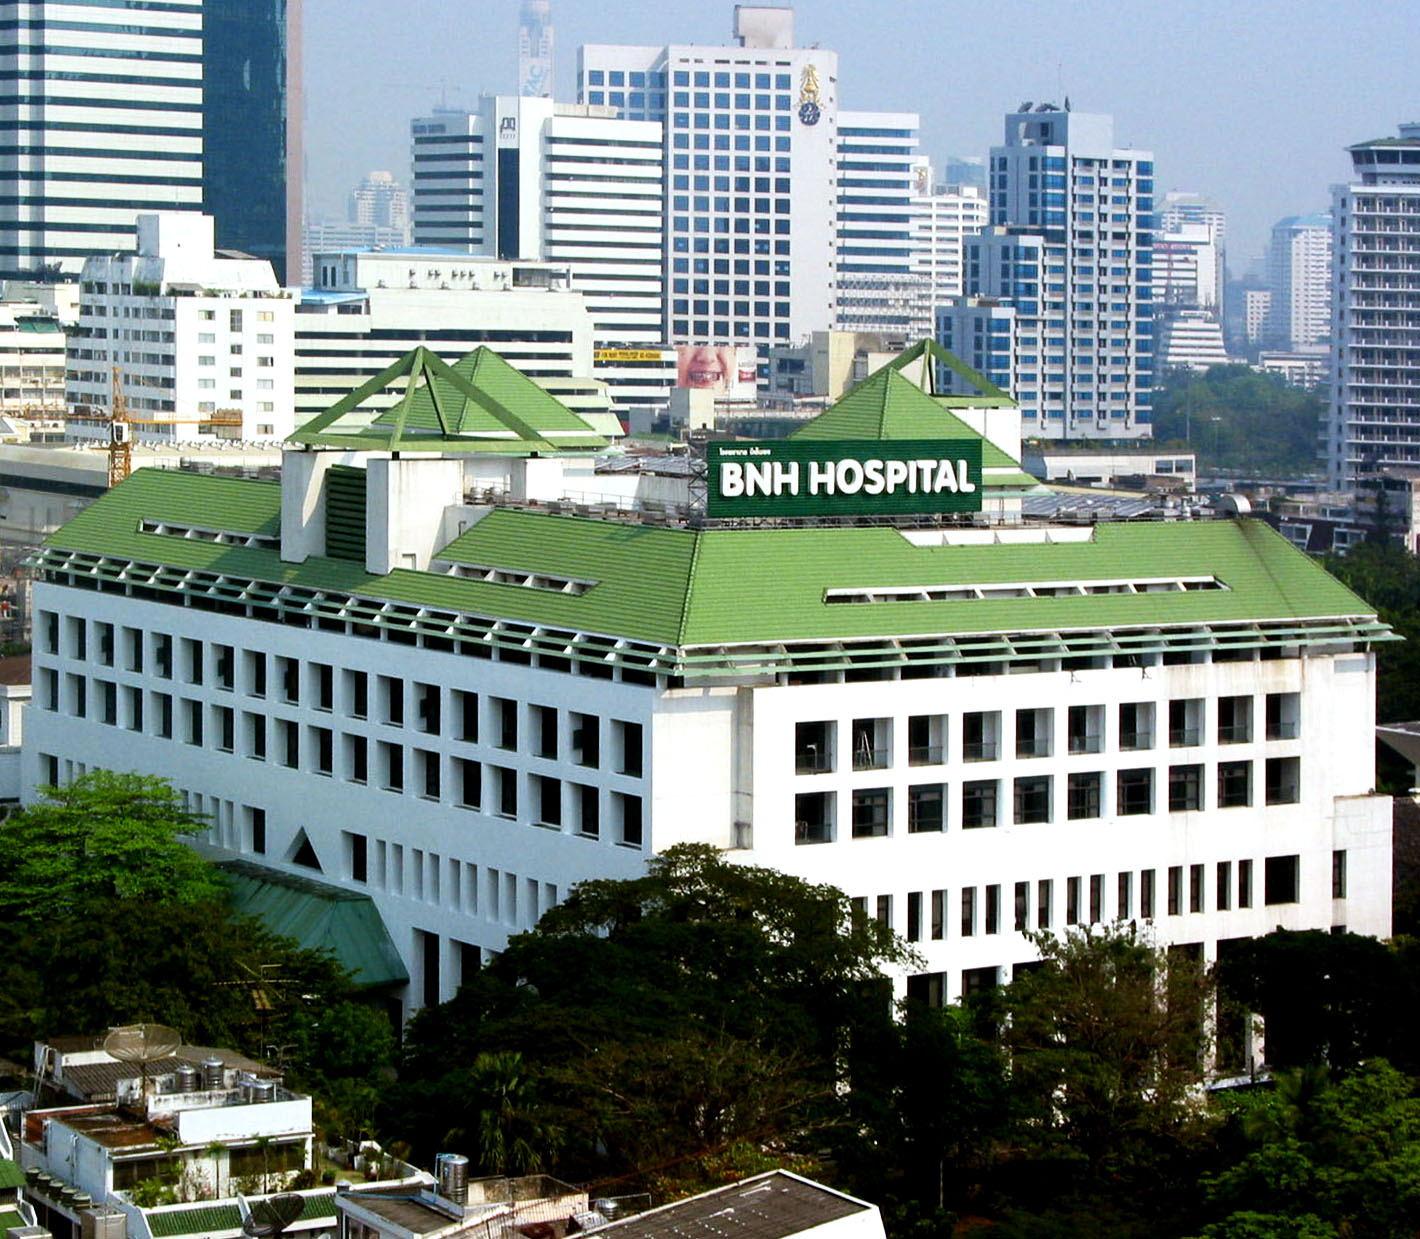 BNH Hospital 医院